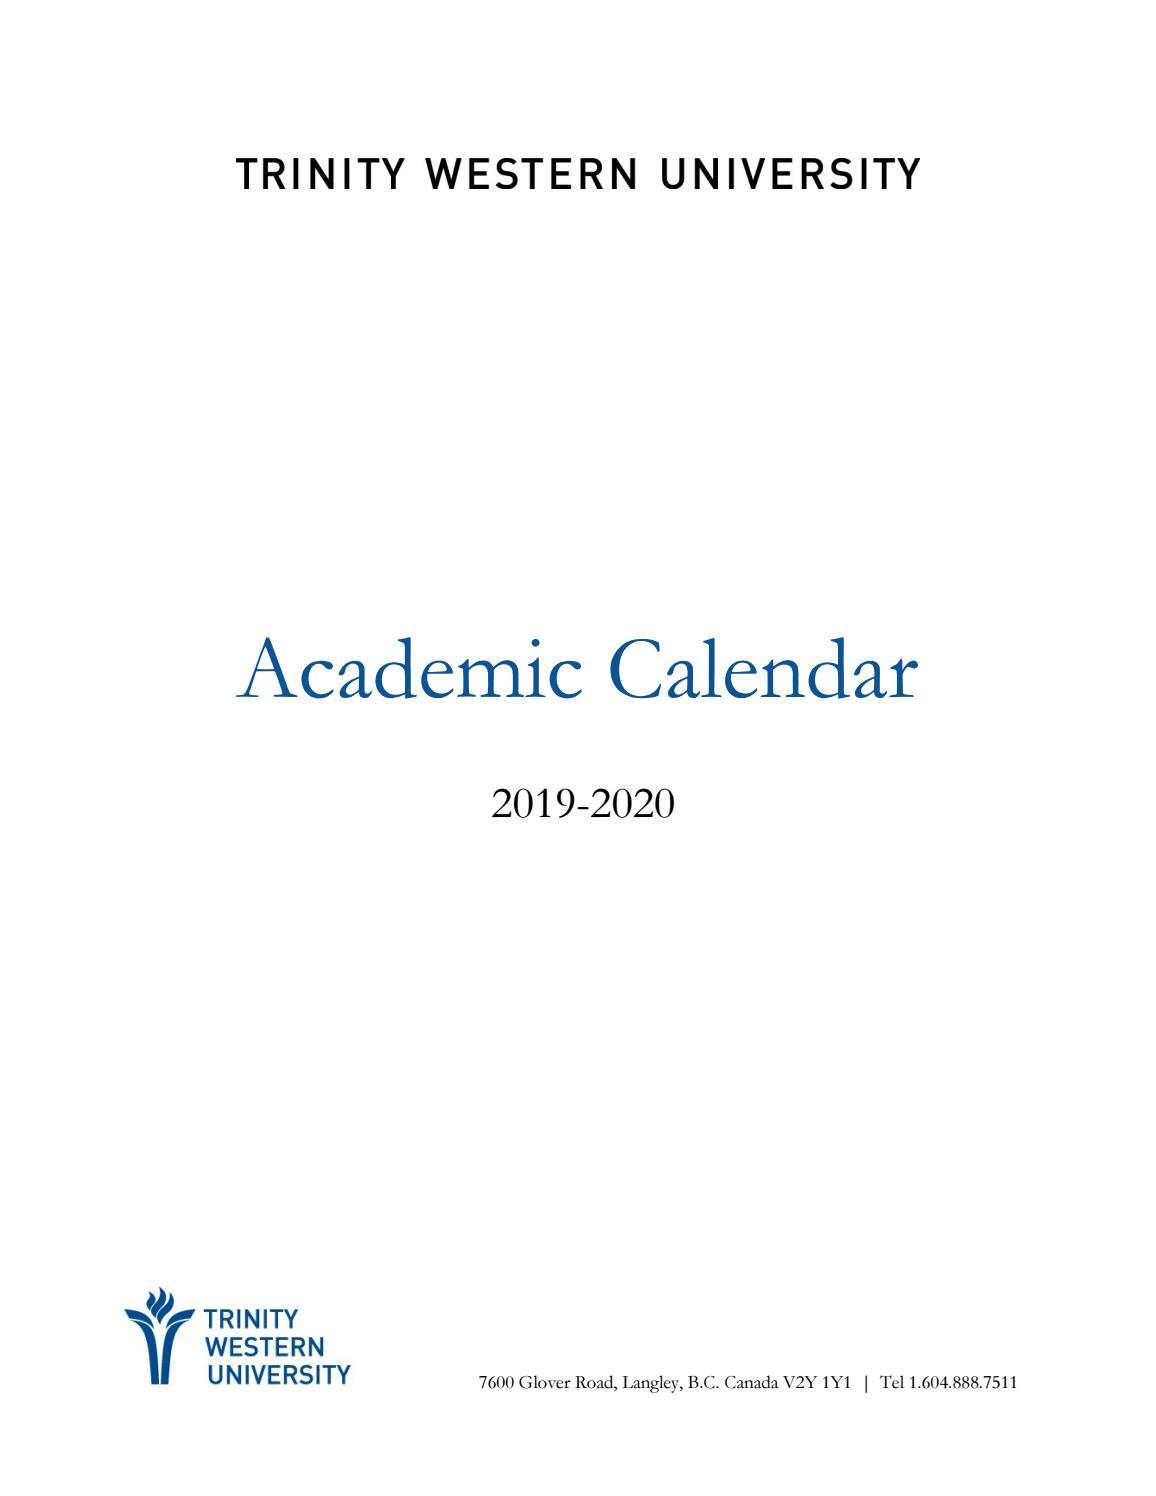 201920 Academic Calendar By Twu  Issuu with regard to 2020 And 2020 Pei School Calendar